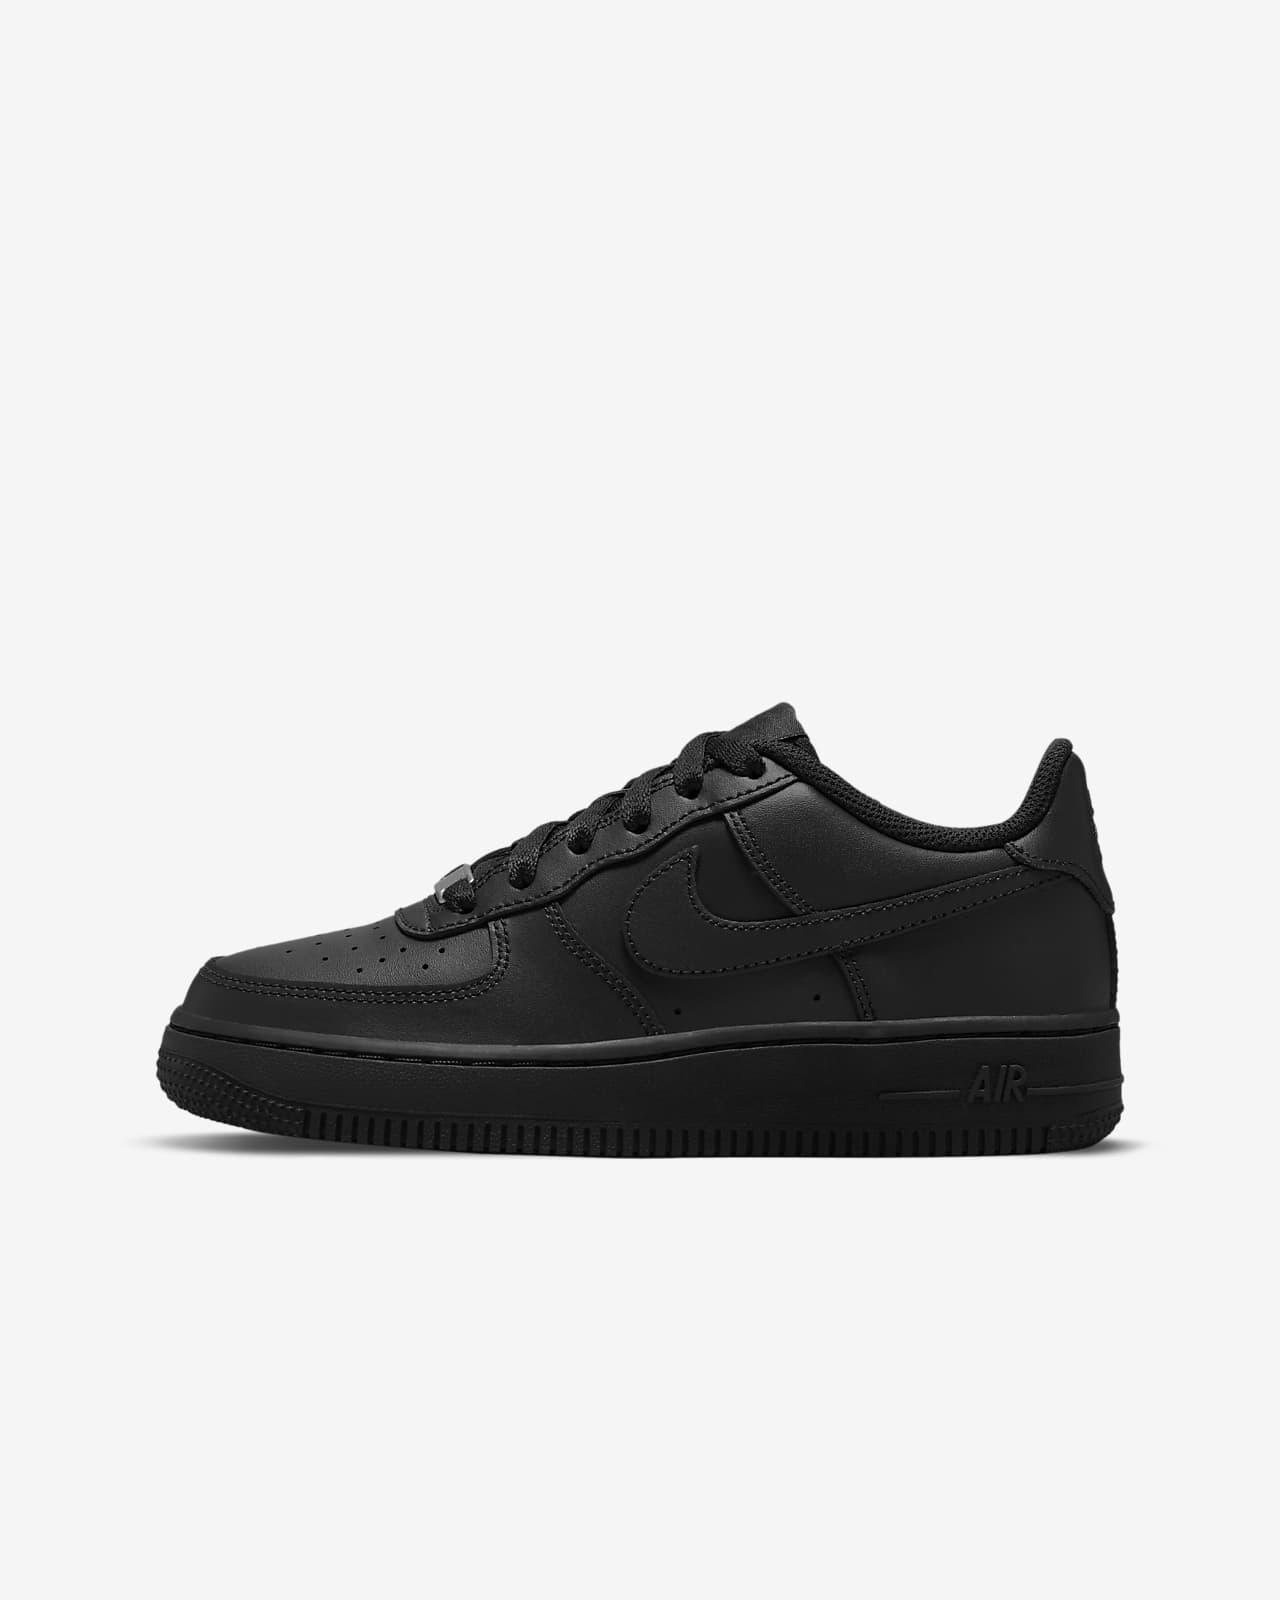 Nike Air Force 1 LE Older Kids' Shoe